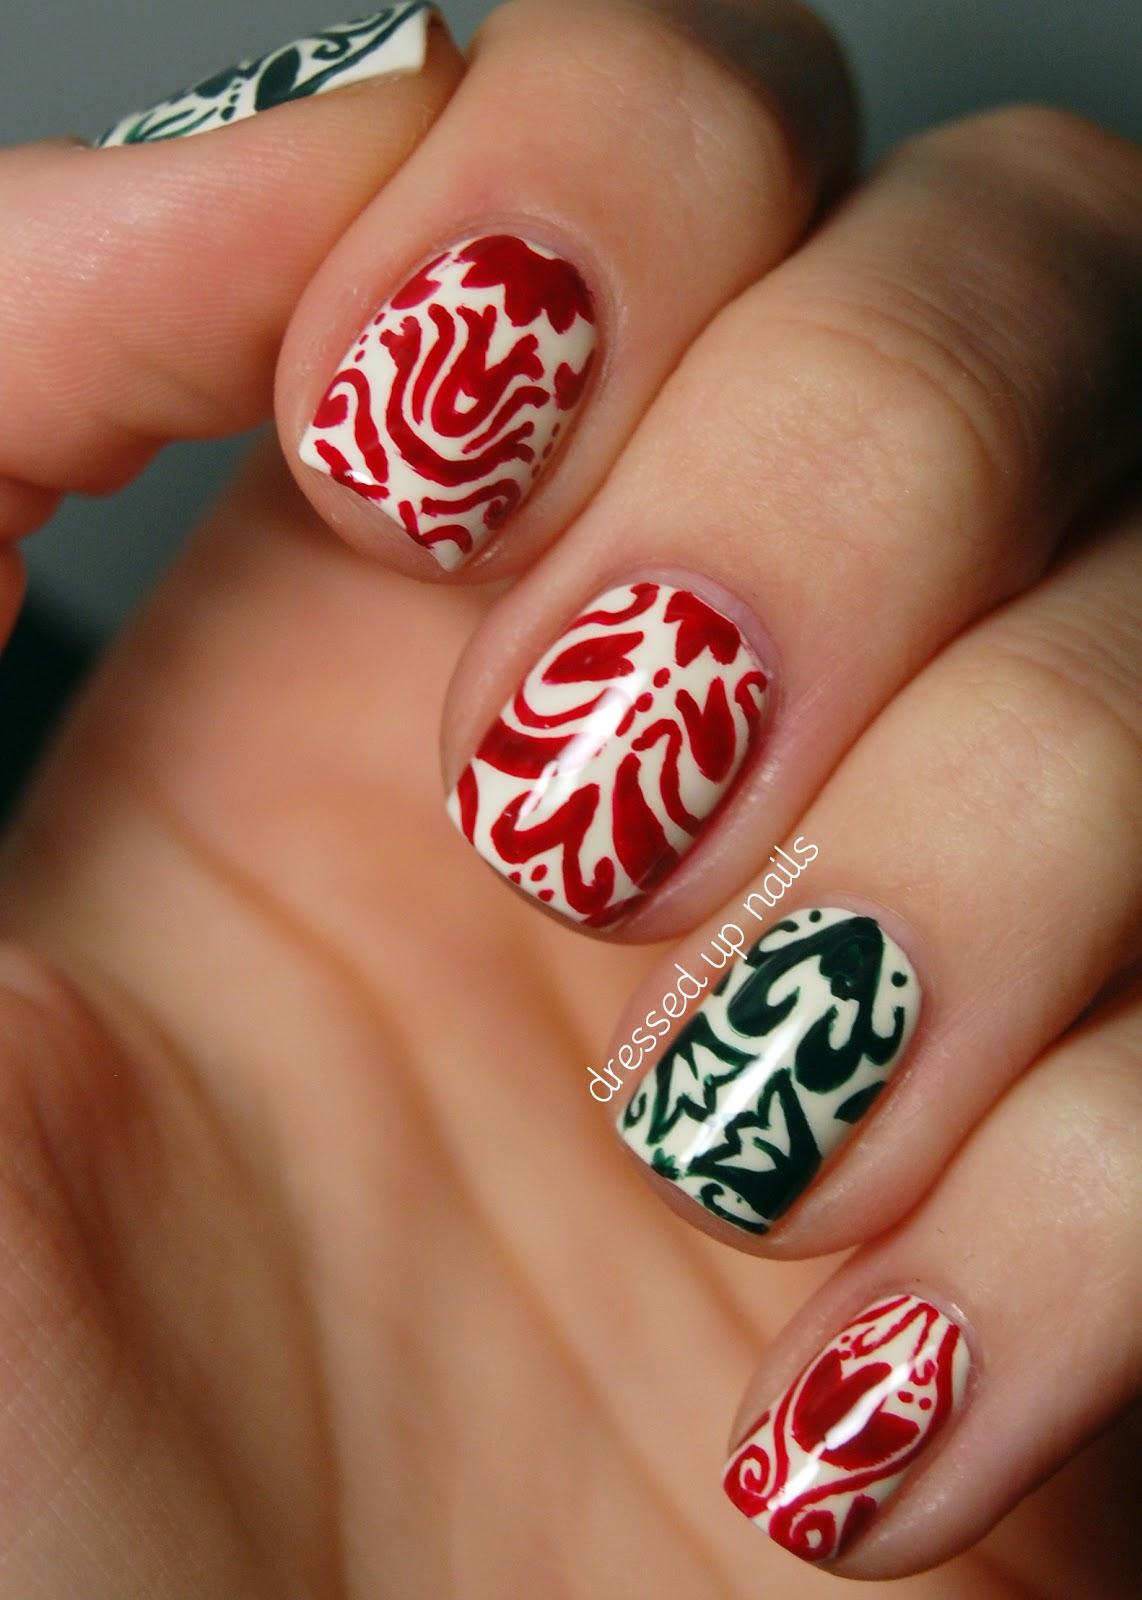 Amazing Nail Art   TIC TaC